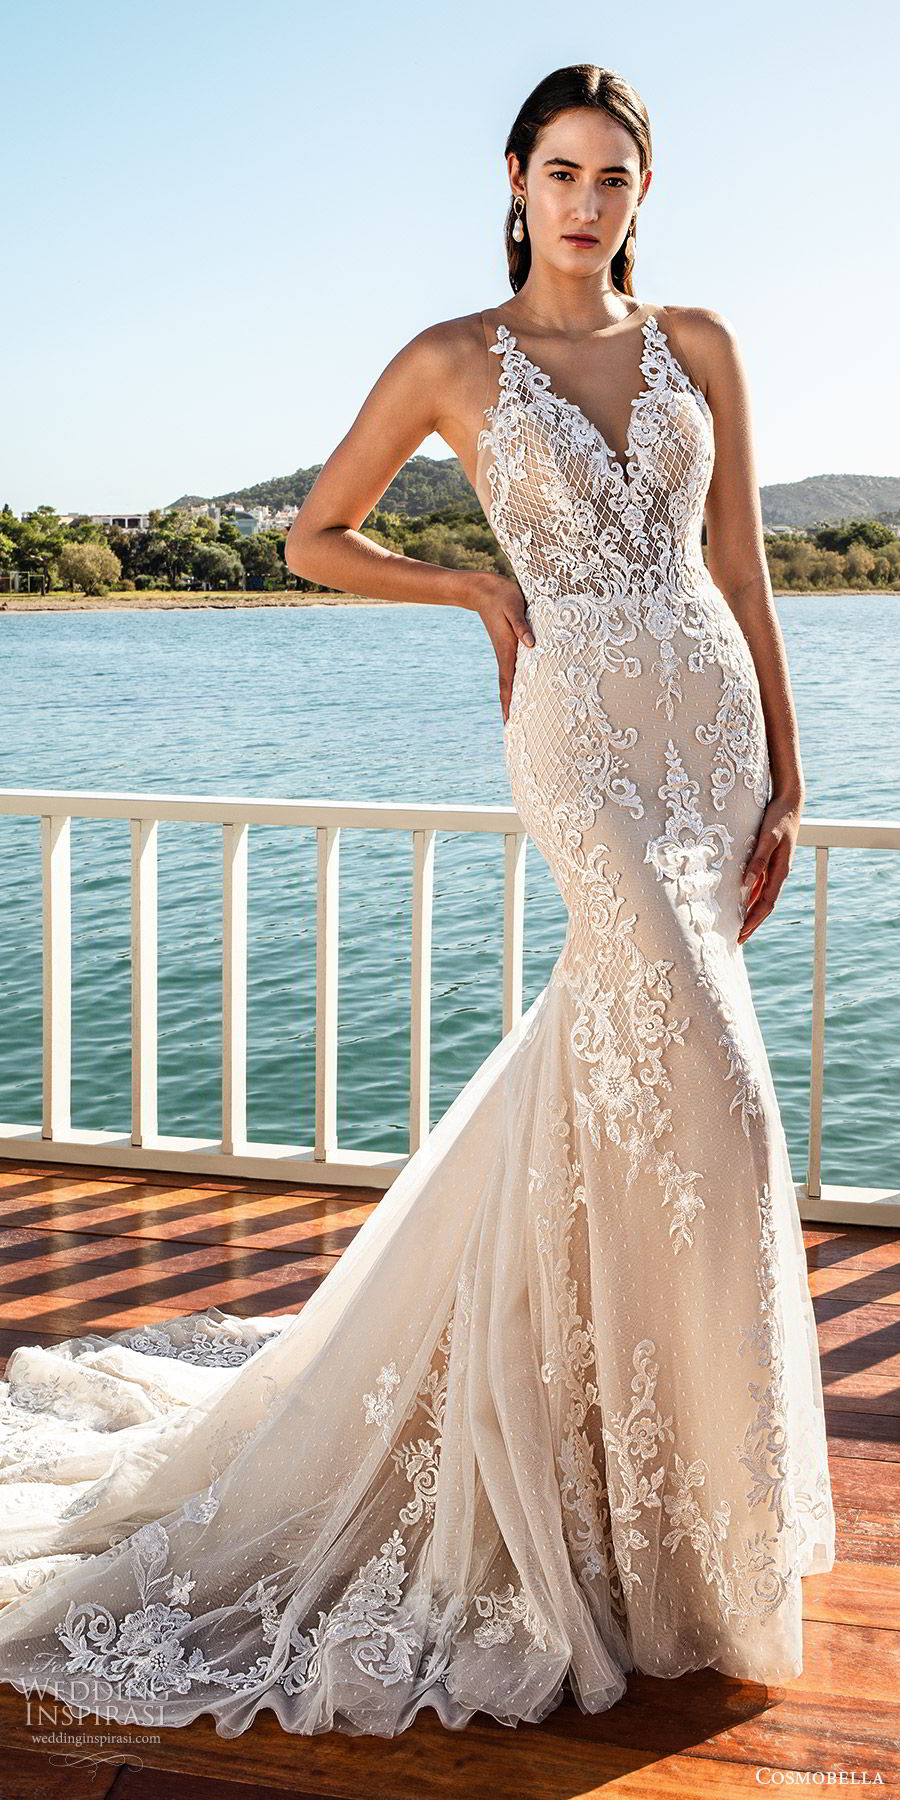 cosmobella 2020 bridal sleeveless illusion straps v neckline fully embellished sheath mermaid lace wedding dress (19) glam glitzy elegant illusion back chapel train mv